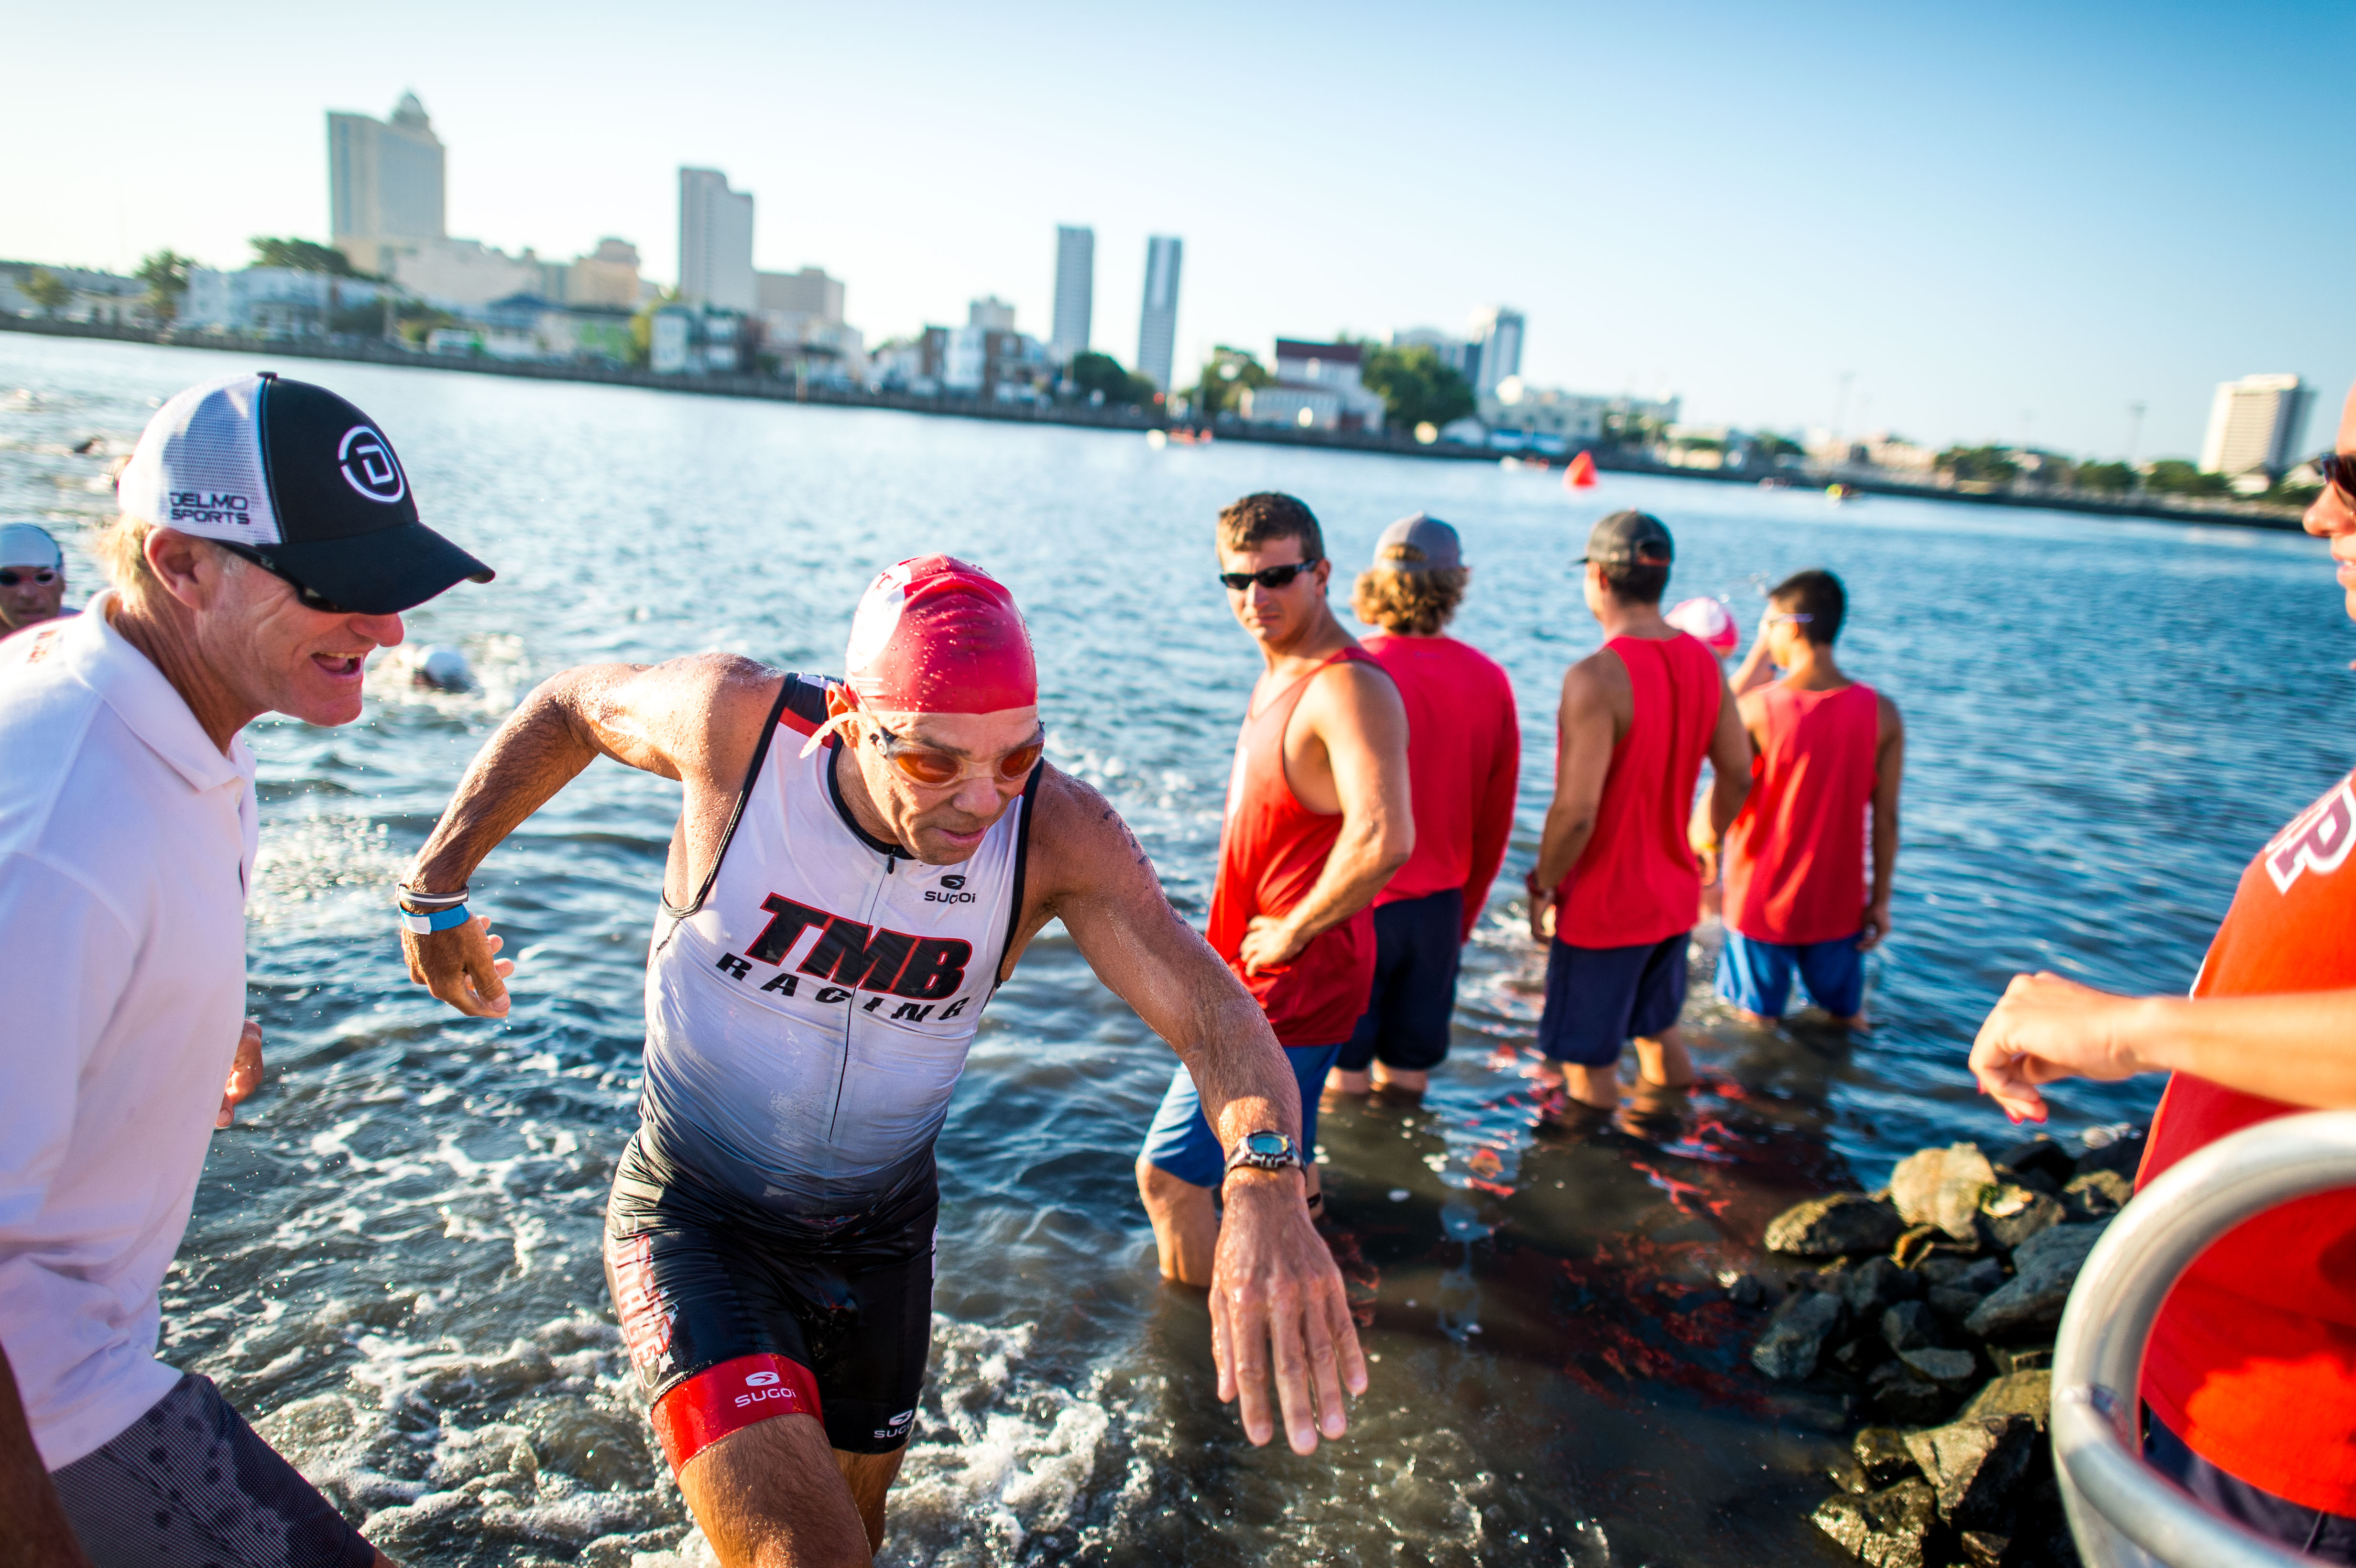 dan - Atlantic City Triathlon